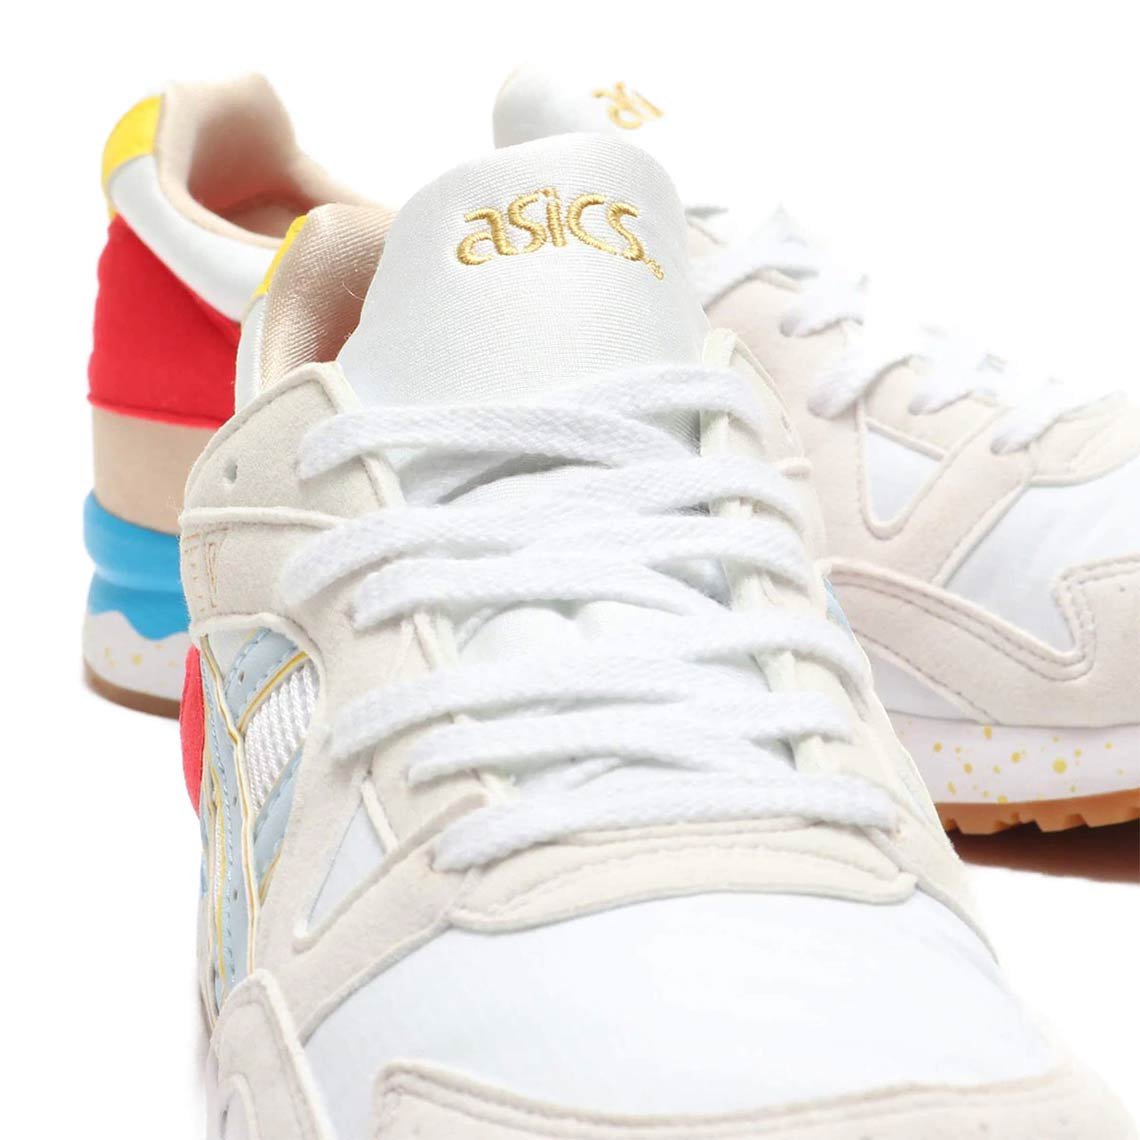 8e67bf76a1 Nike Vapormax 2 Orca Black + White 942842-016 - OPMSTREAMS